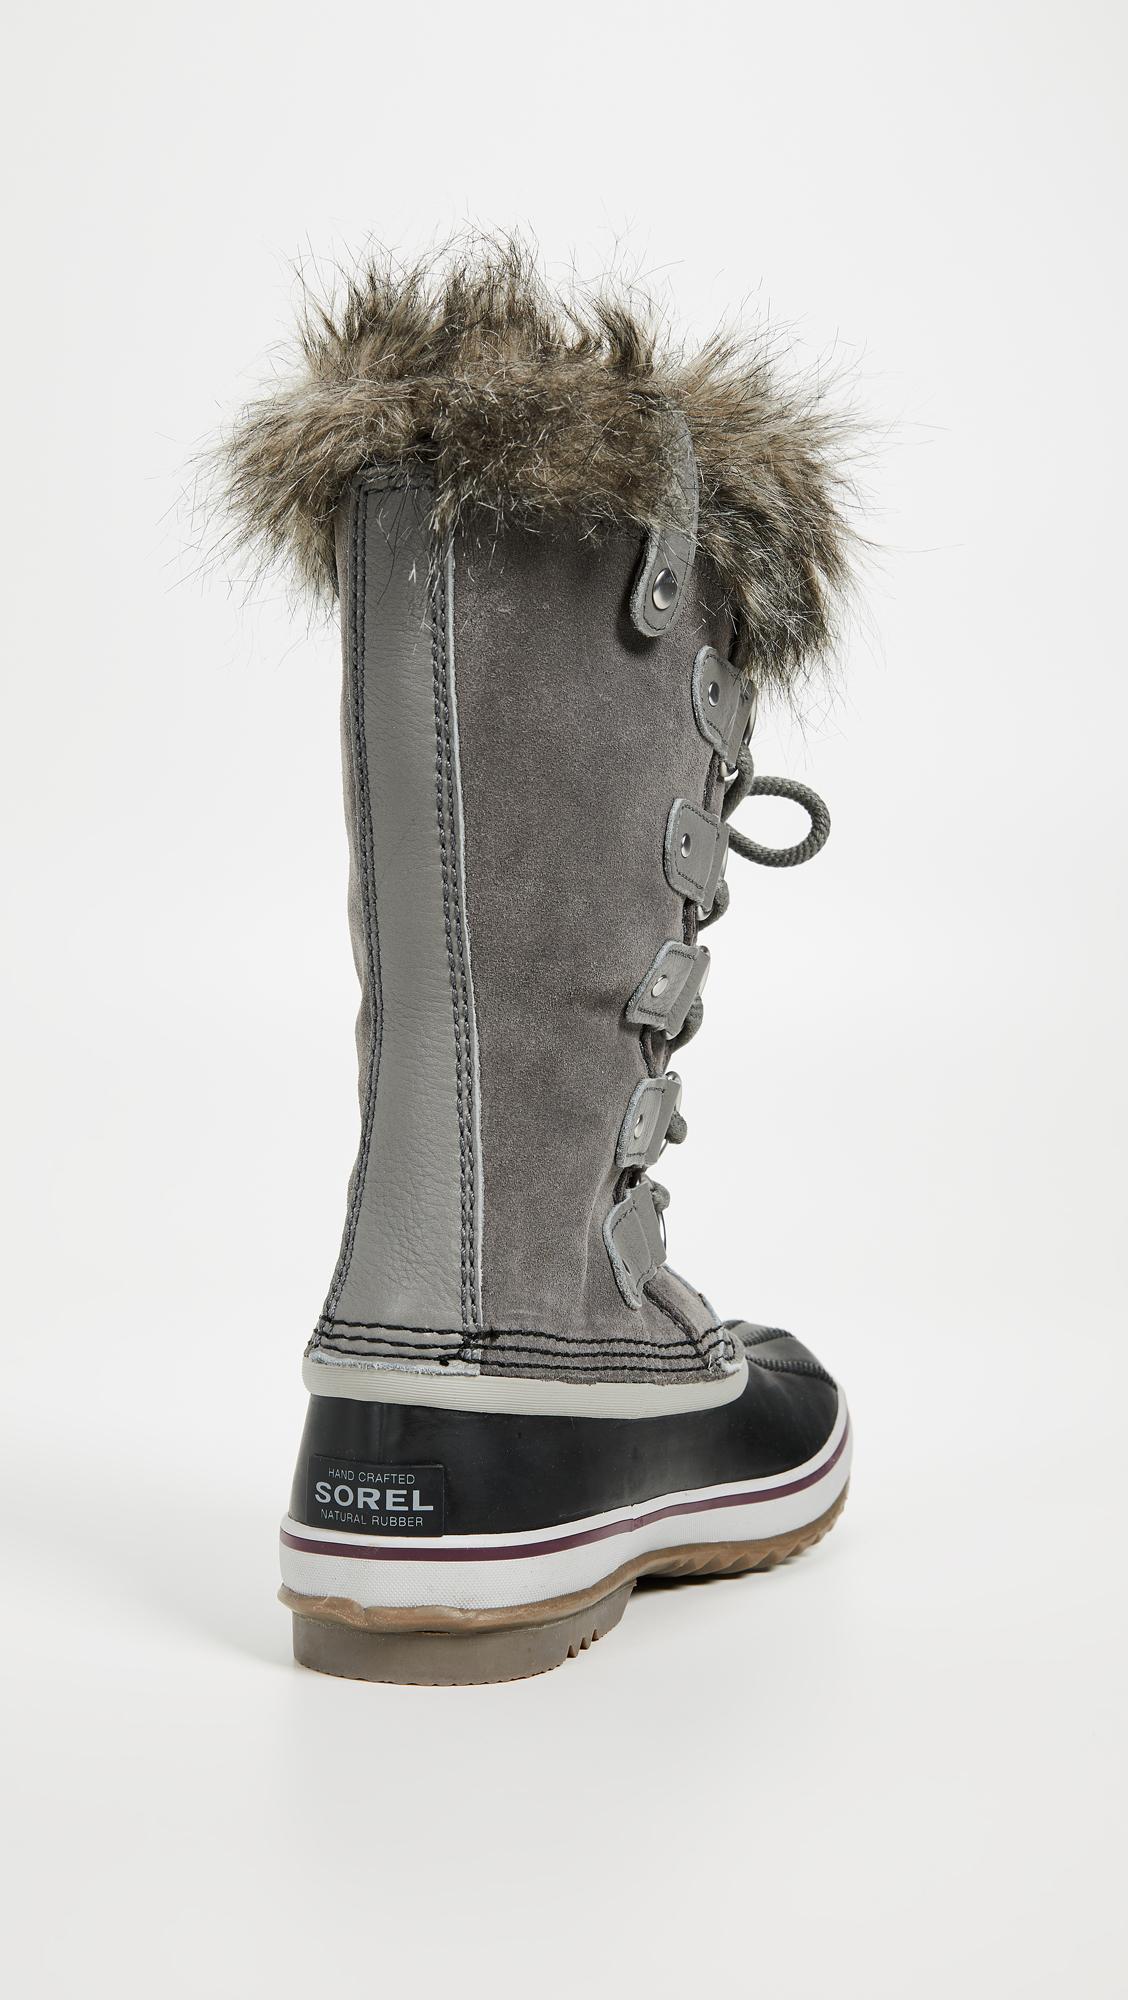 8b74ee33b0713 Sorel Joan of Arctic Faux Fur Boots